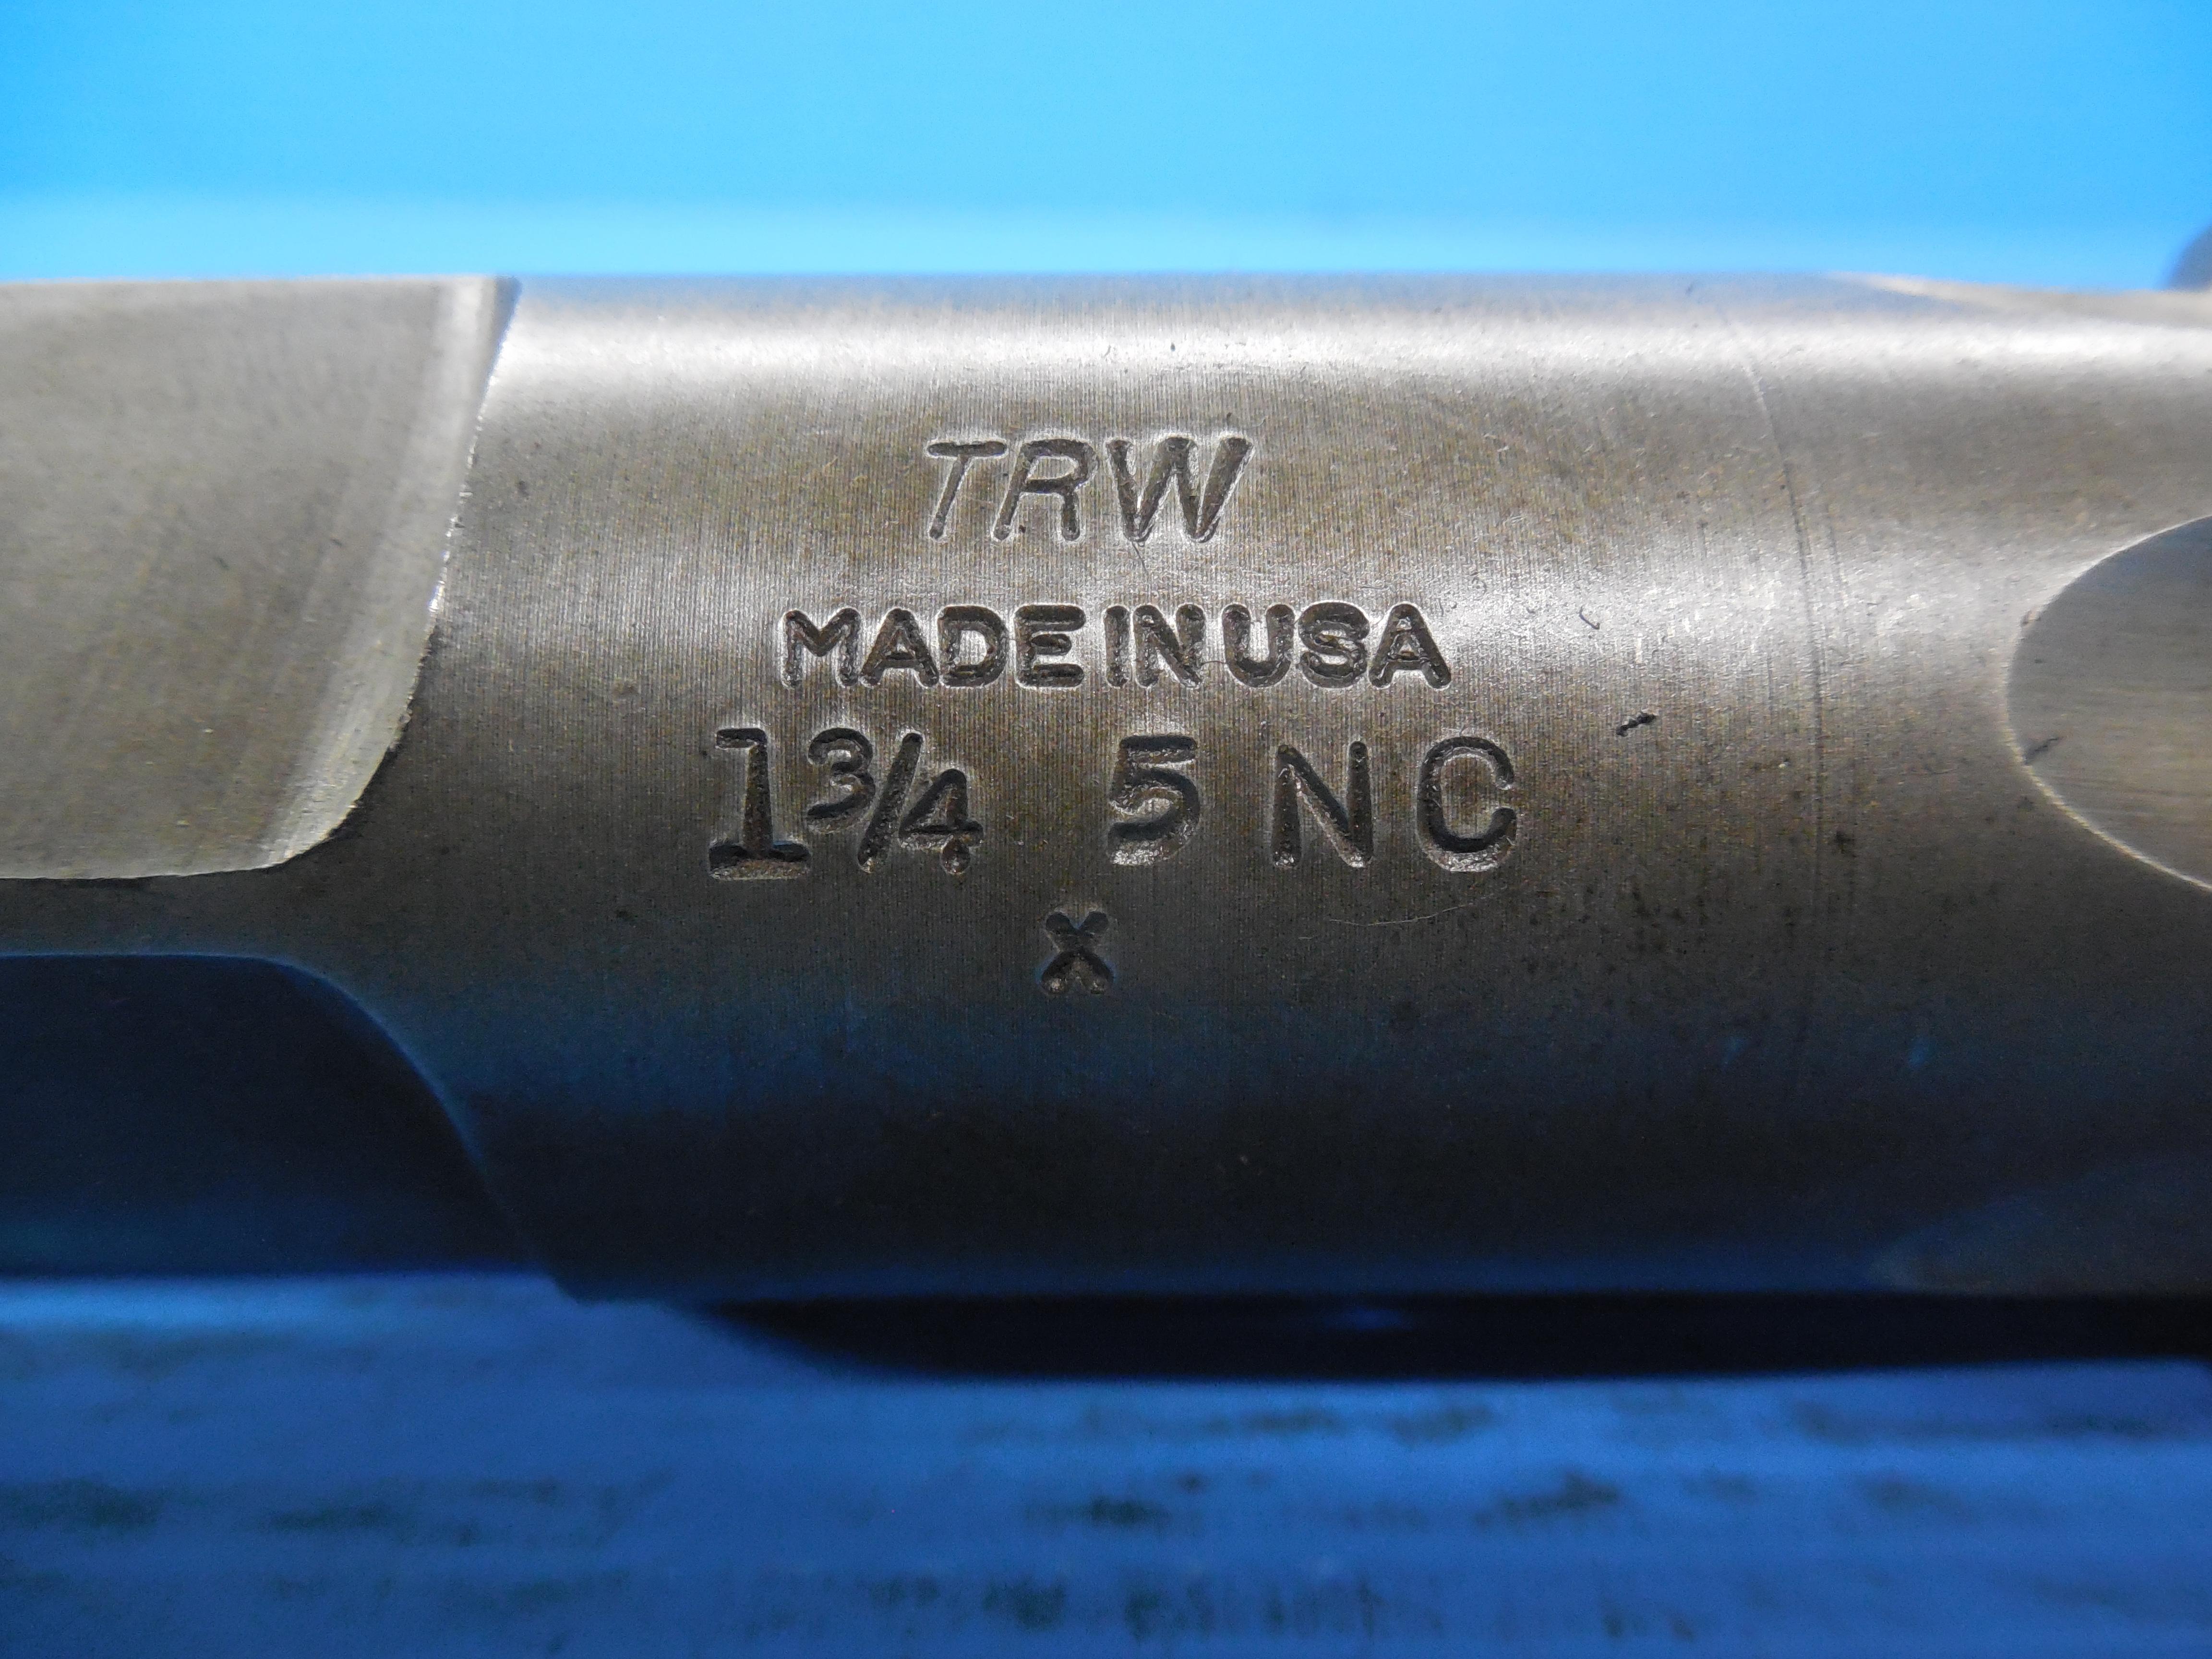 0.2340 Cutting Diameter Aluminum Titanium Nitride Coating 2 Cutting Length SGS 57170 101 Slow Spiral Drills 3-1//4 Length